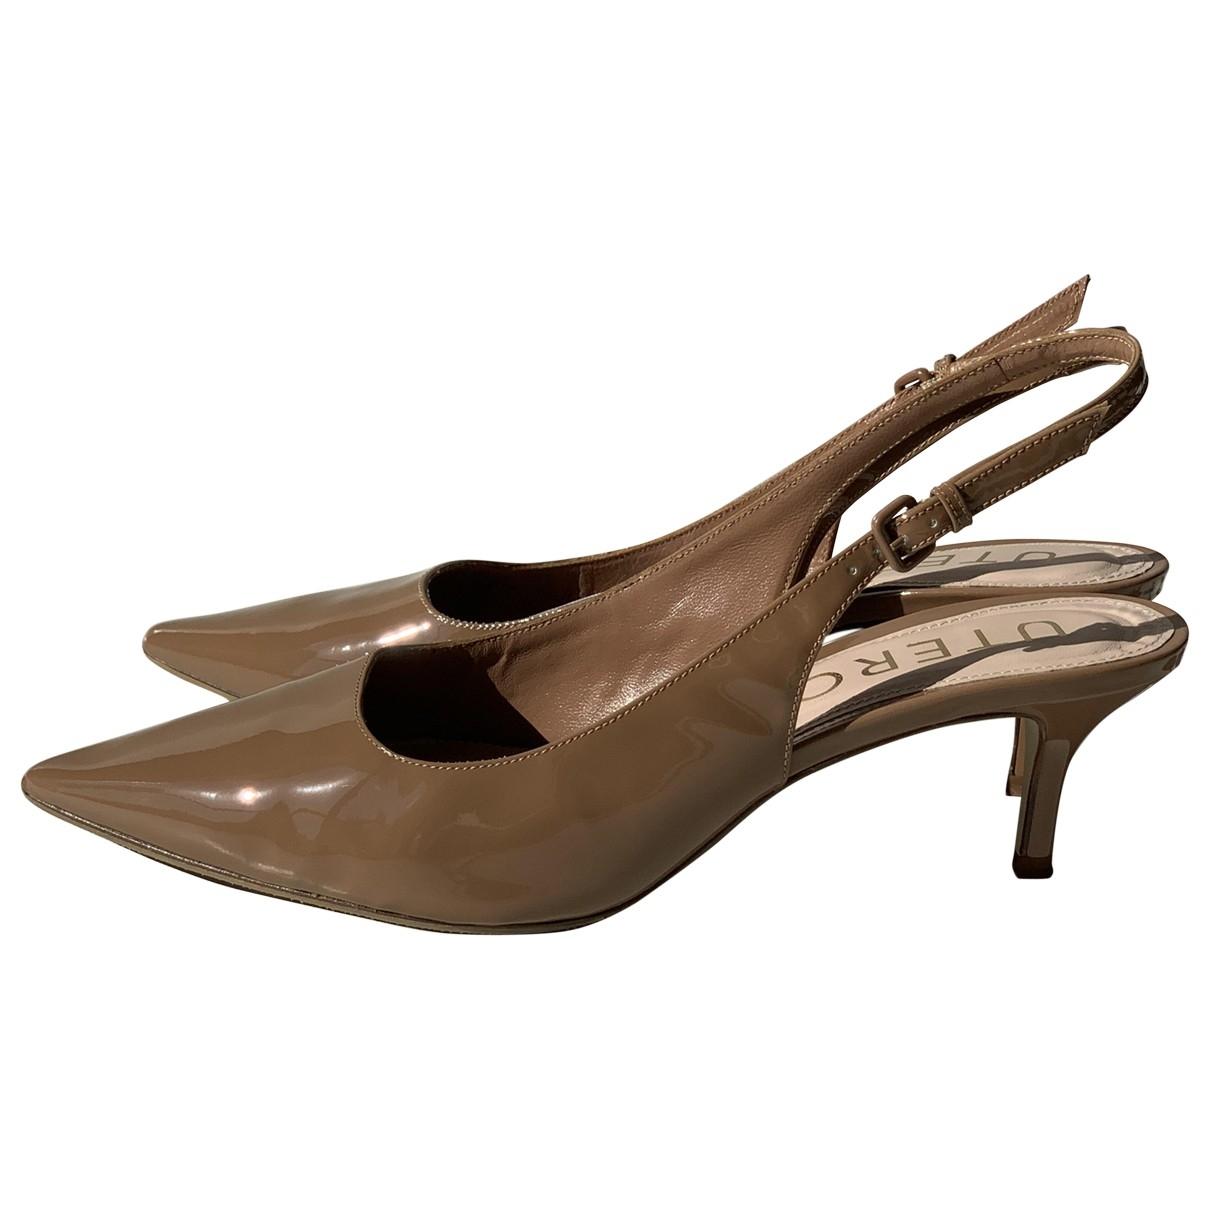 Uterque - Escarpins   pour femme en cuir - camel